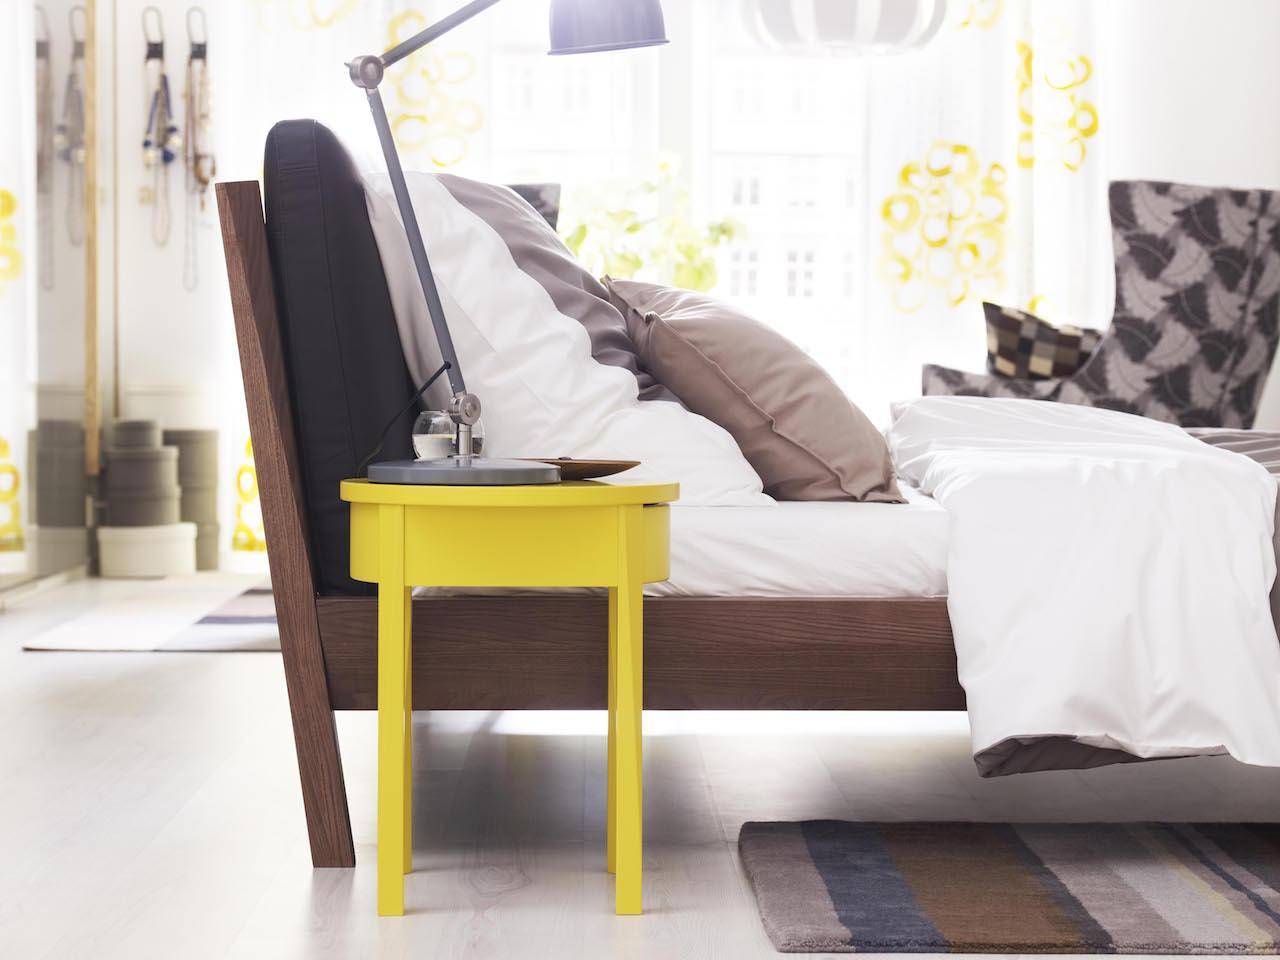 Letto flaxa ikea opinioni stunning gallery of ecopelle for Ikea letto flaxa